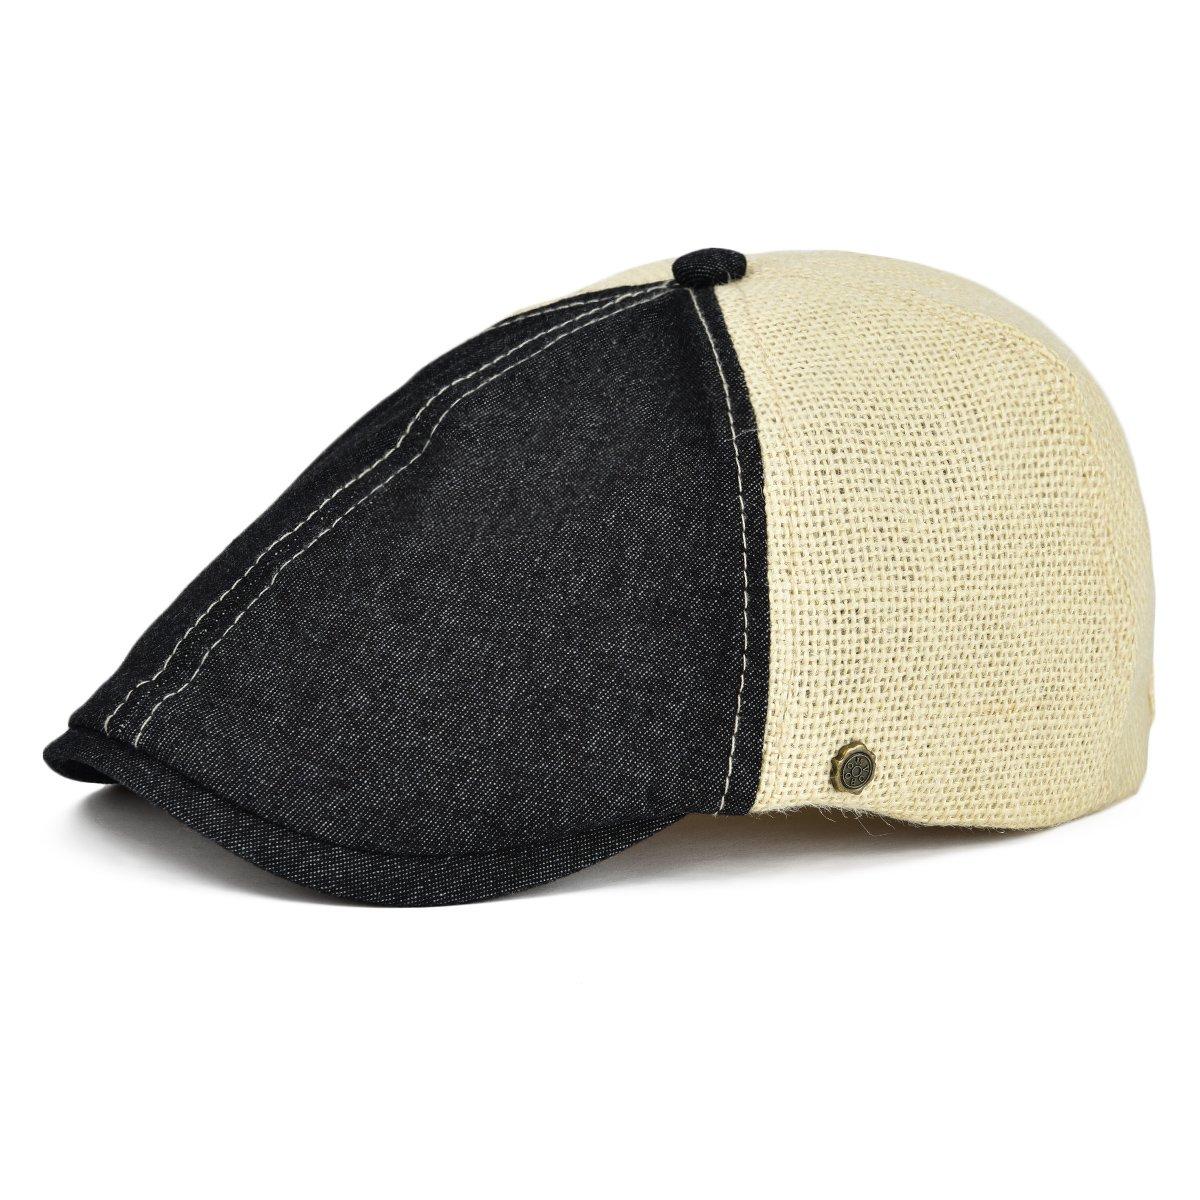 2edbd412c59 VOBOOM Ivy Caps Breathable Cotton Hemp Fabric Flat Caps Cabbie Hat (One  Adjustable Size 58cm-60cm 7 1 4-7 1 2